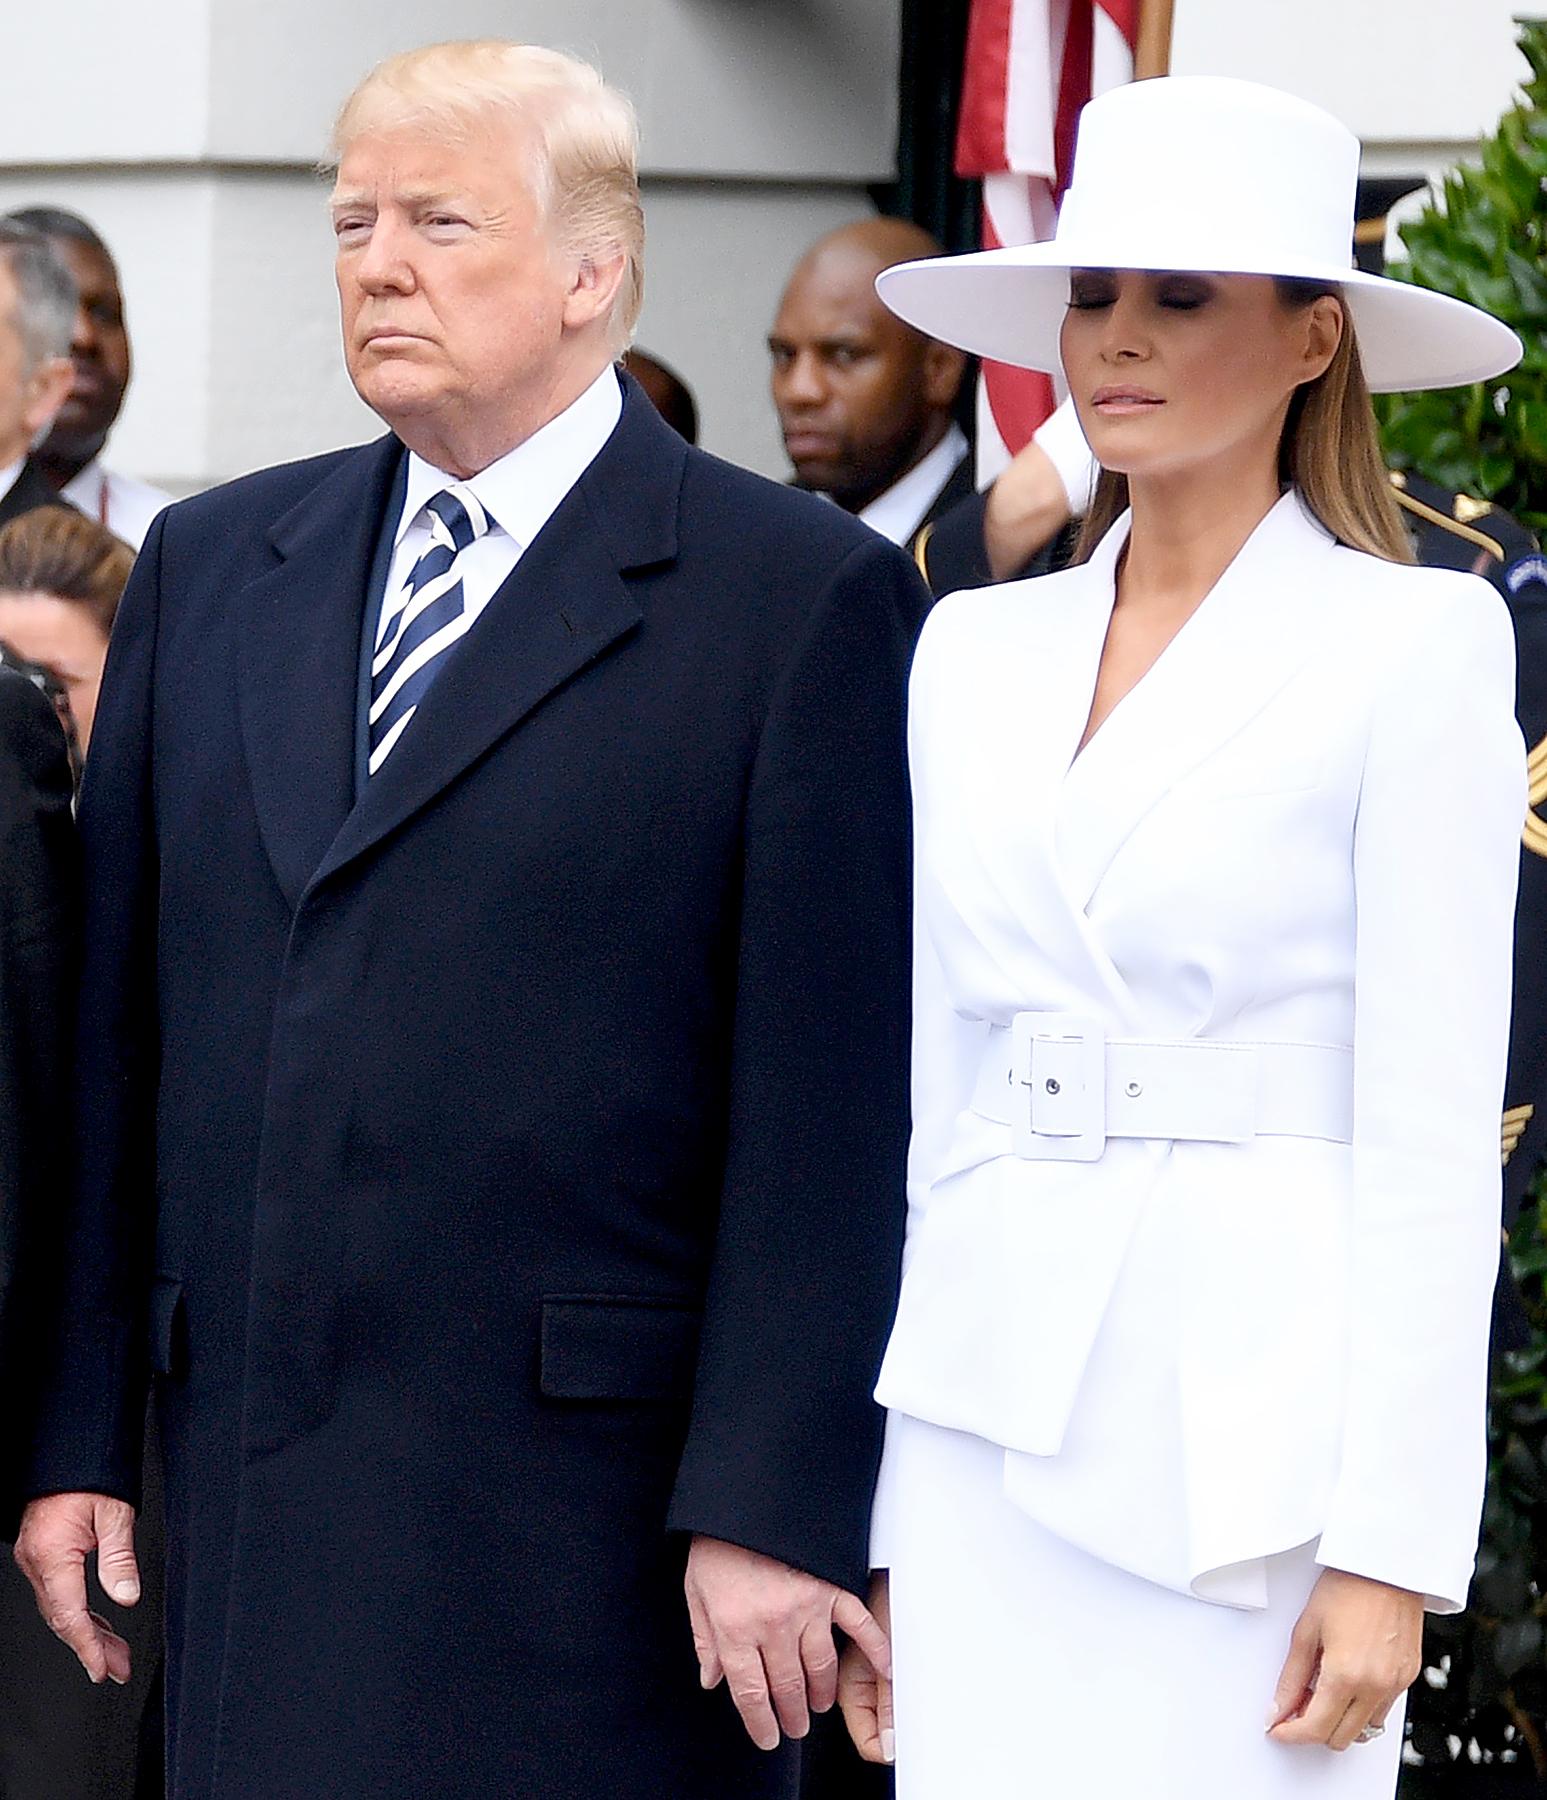 Video. 5 Times Melania Trump ...